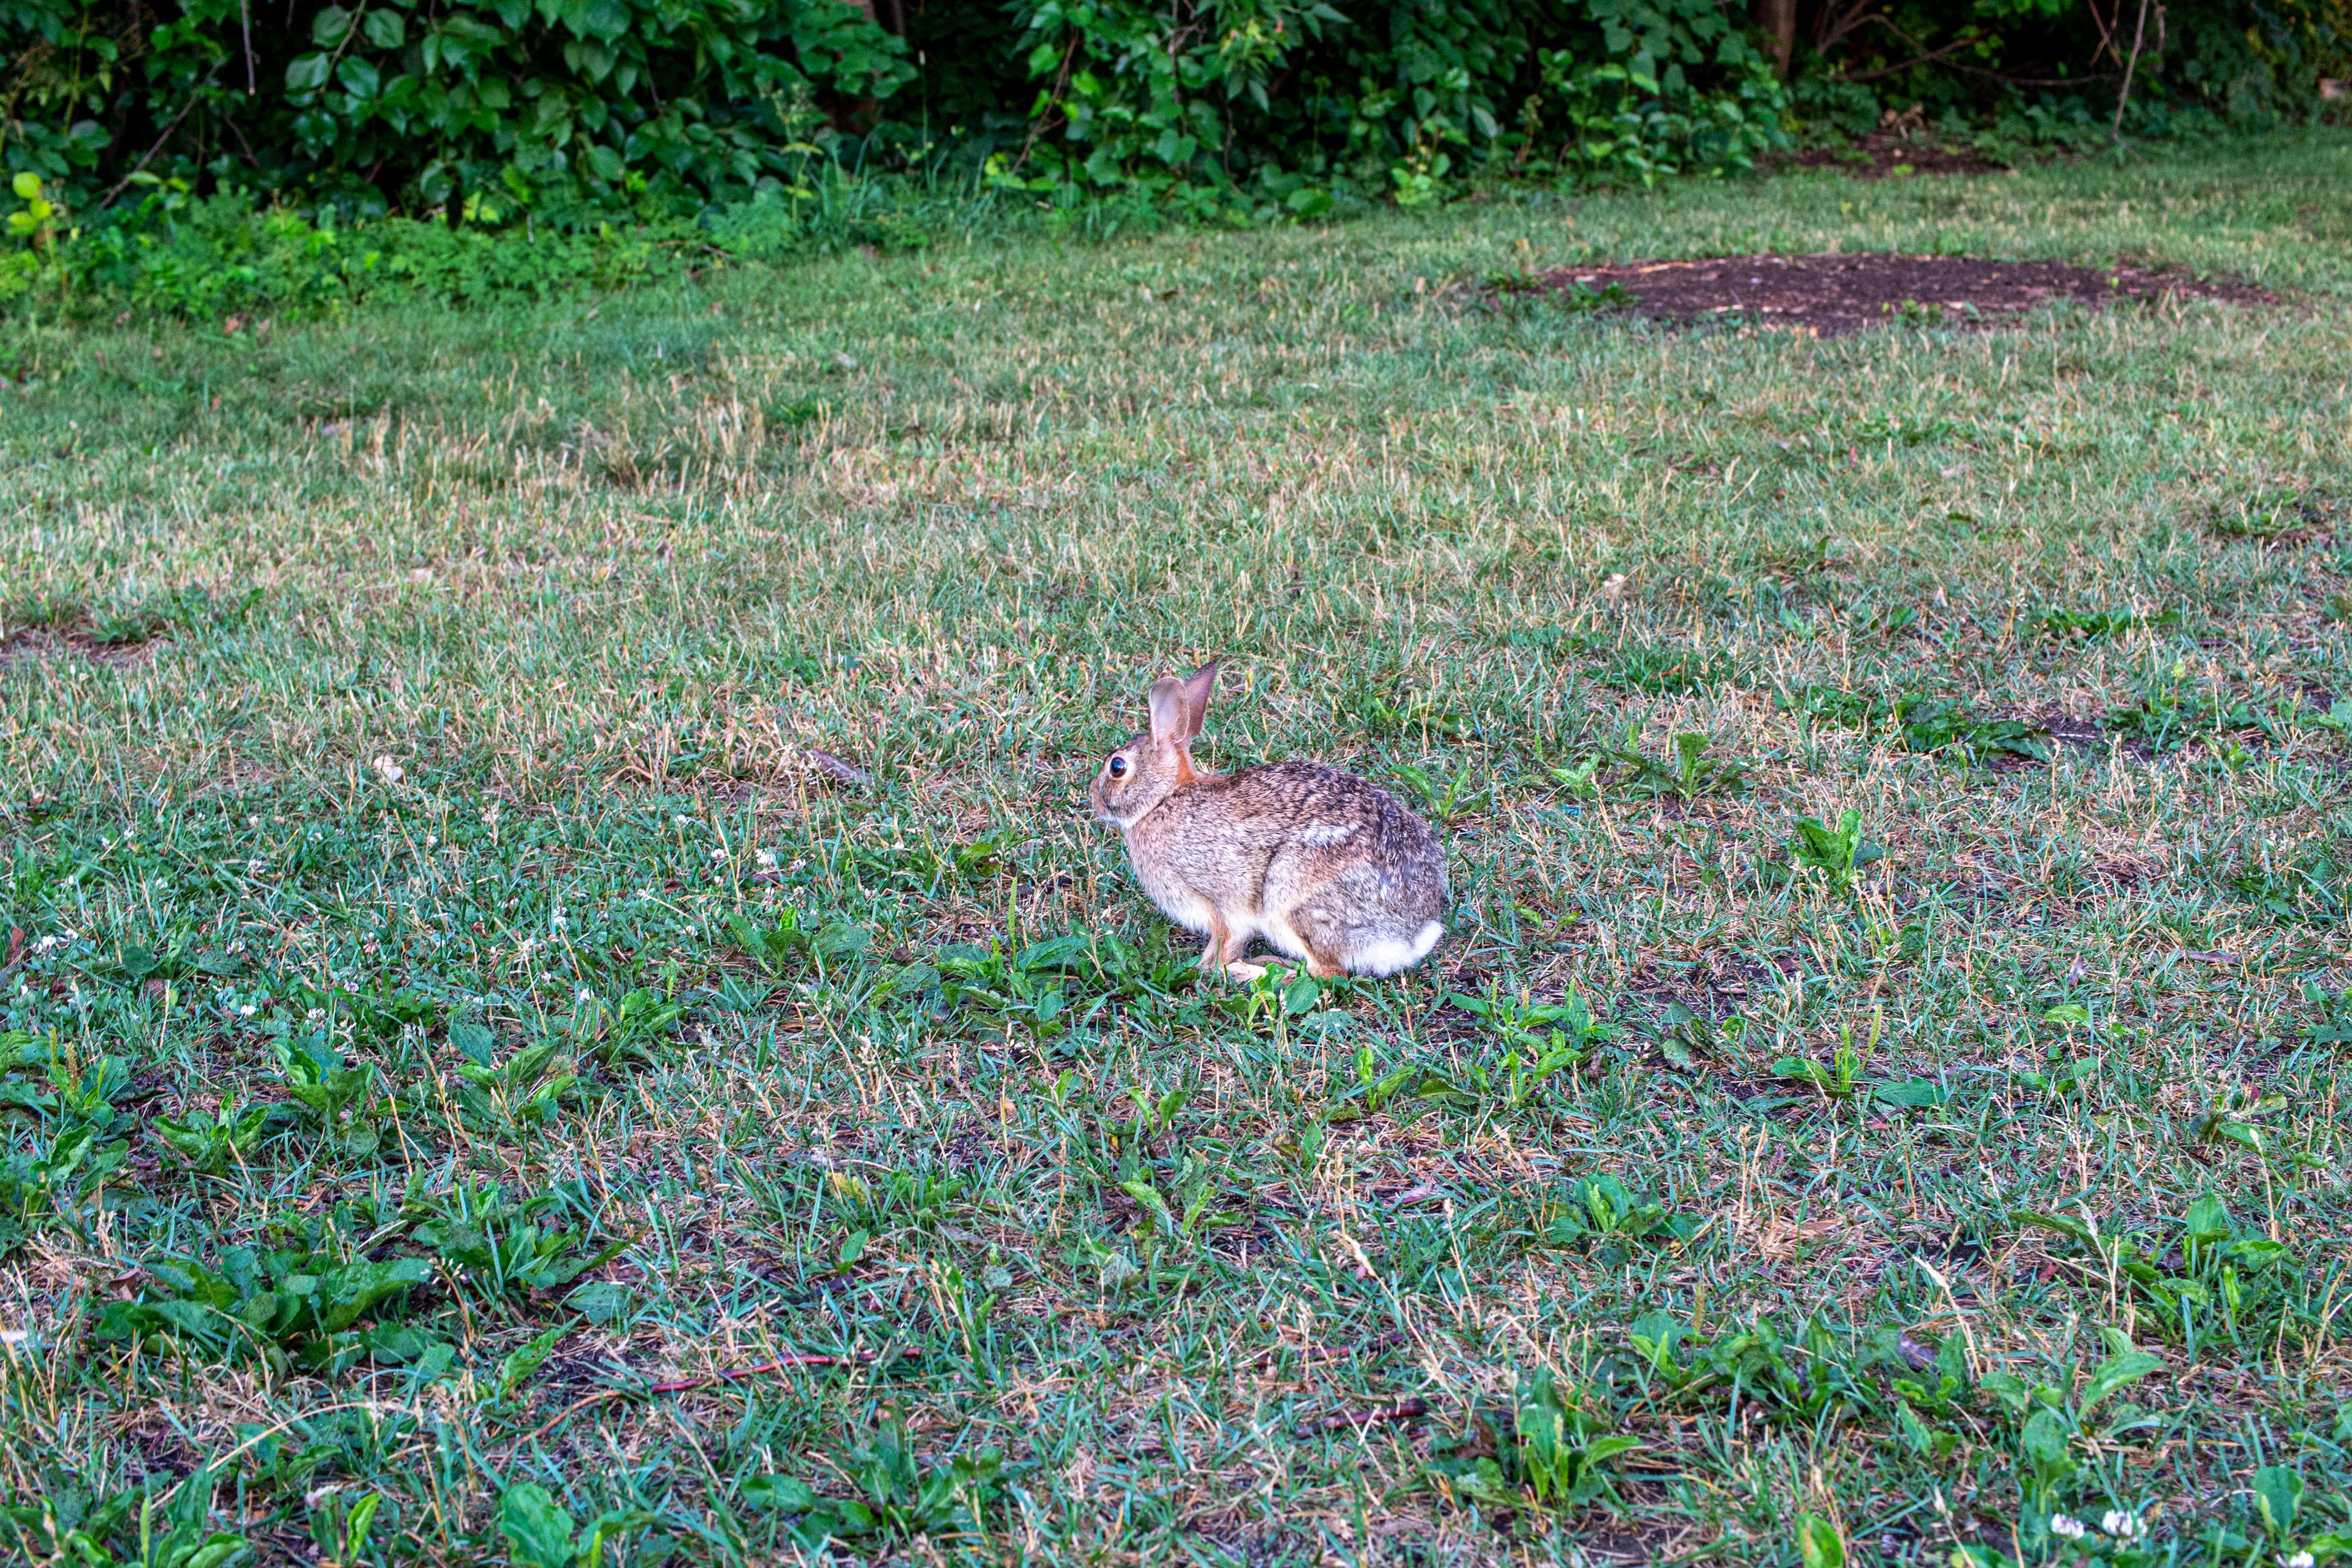 Small round rabbit sitting on a grassy field